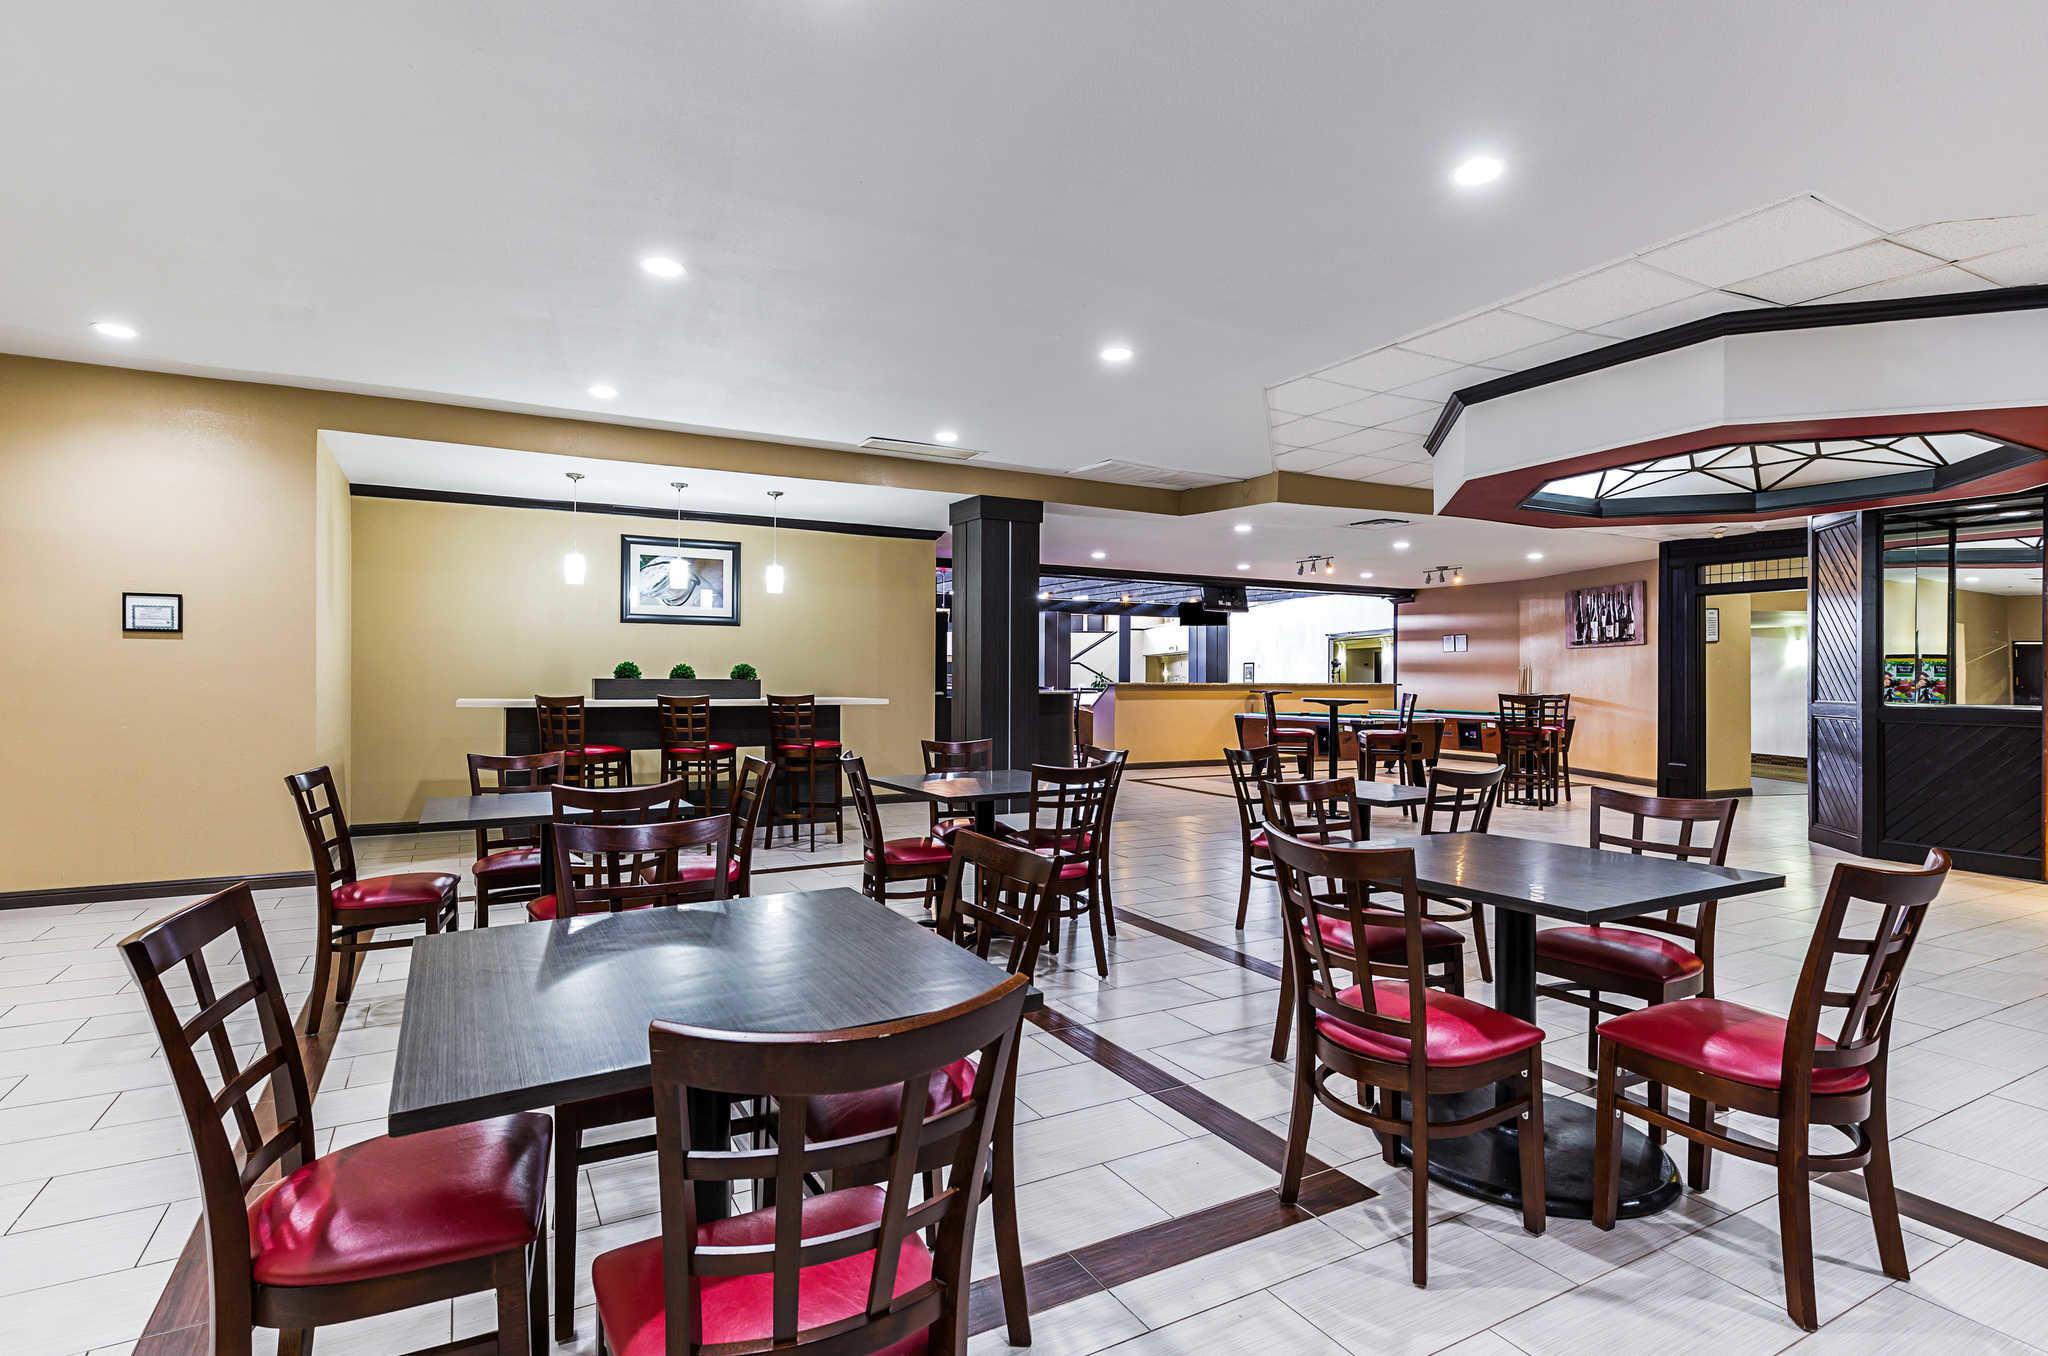 Clarion Inn image 29